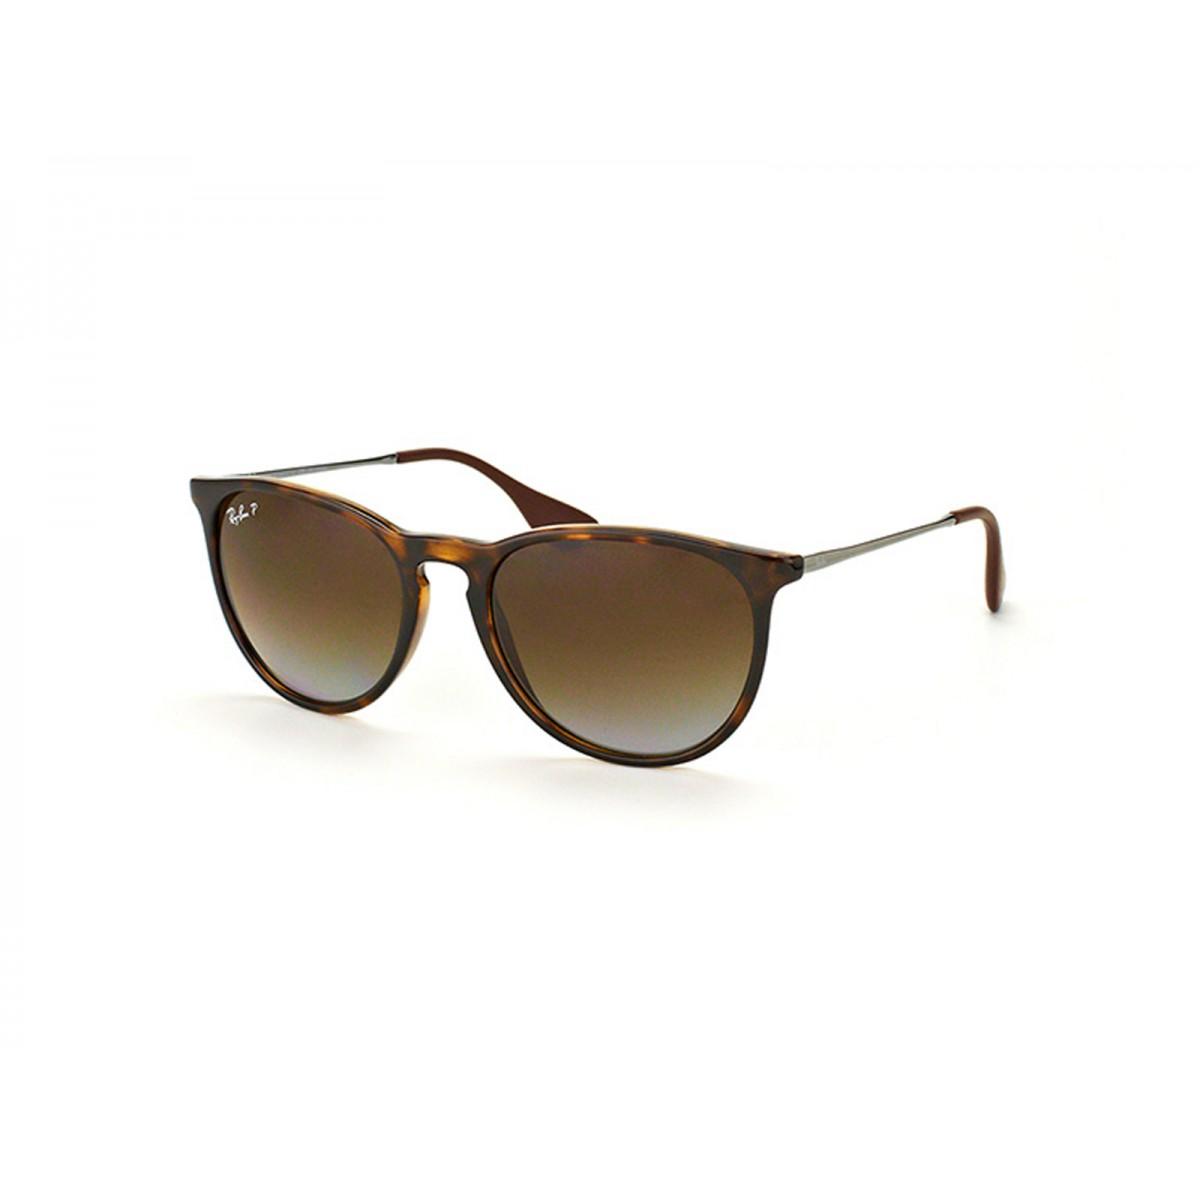 76a13e91d82985 Ray Ban Erika Matte Havana Polarized Unisex Sunglasses RB4171-710 T5 ...